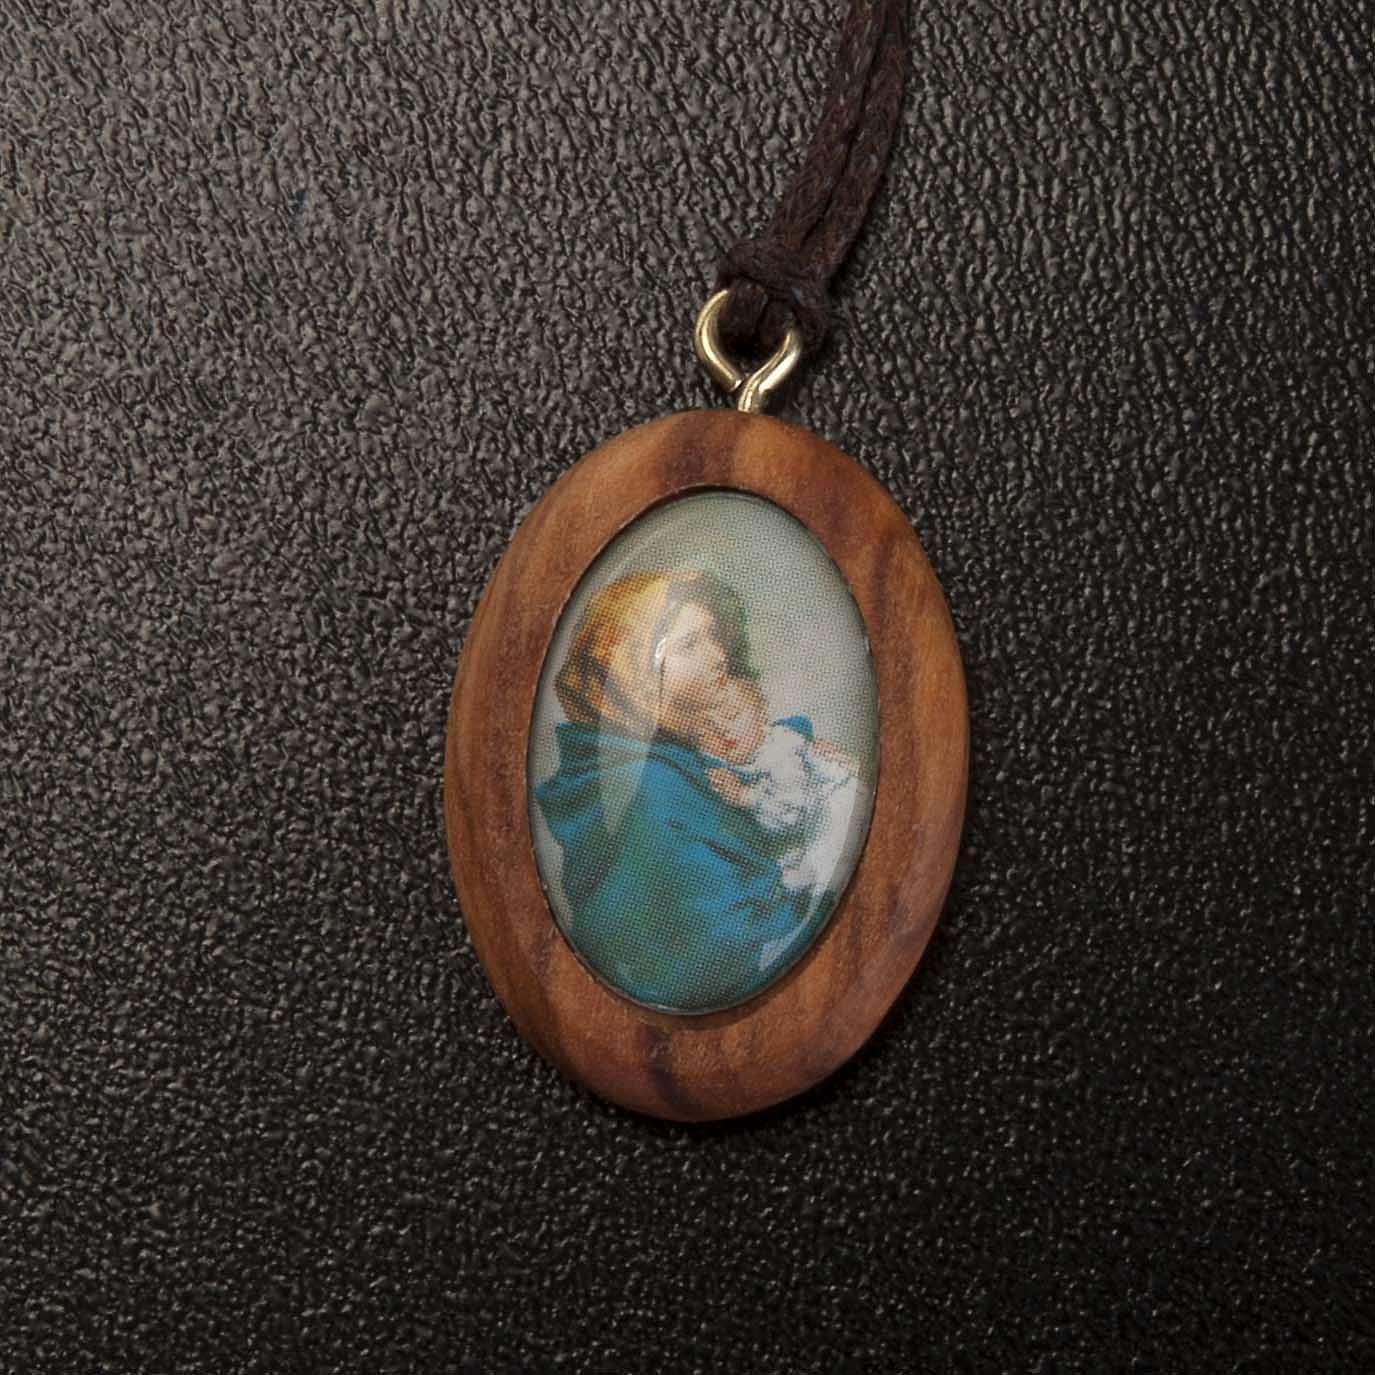 Olive pendant, oval with Ferruzzi's Madonna 4